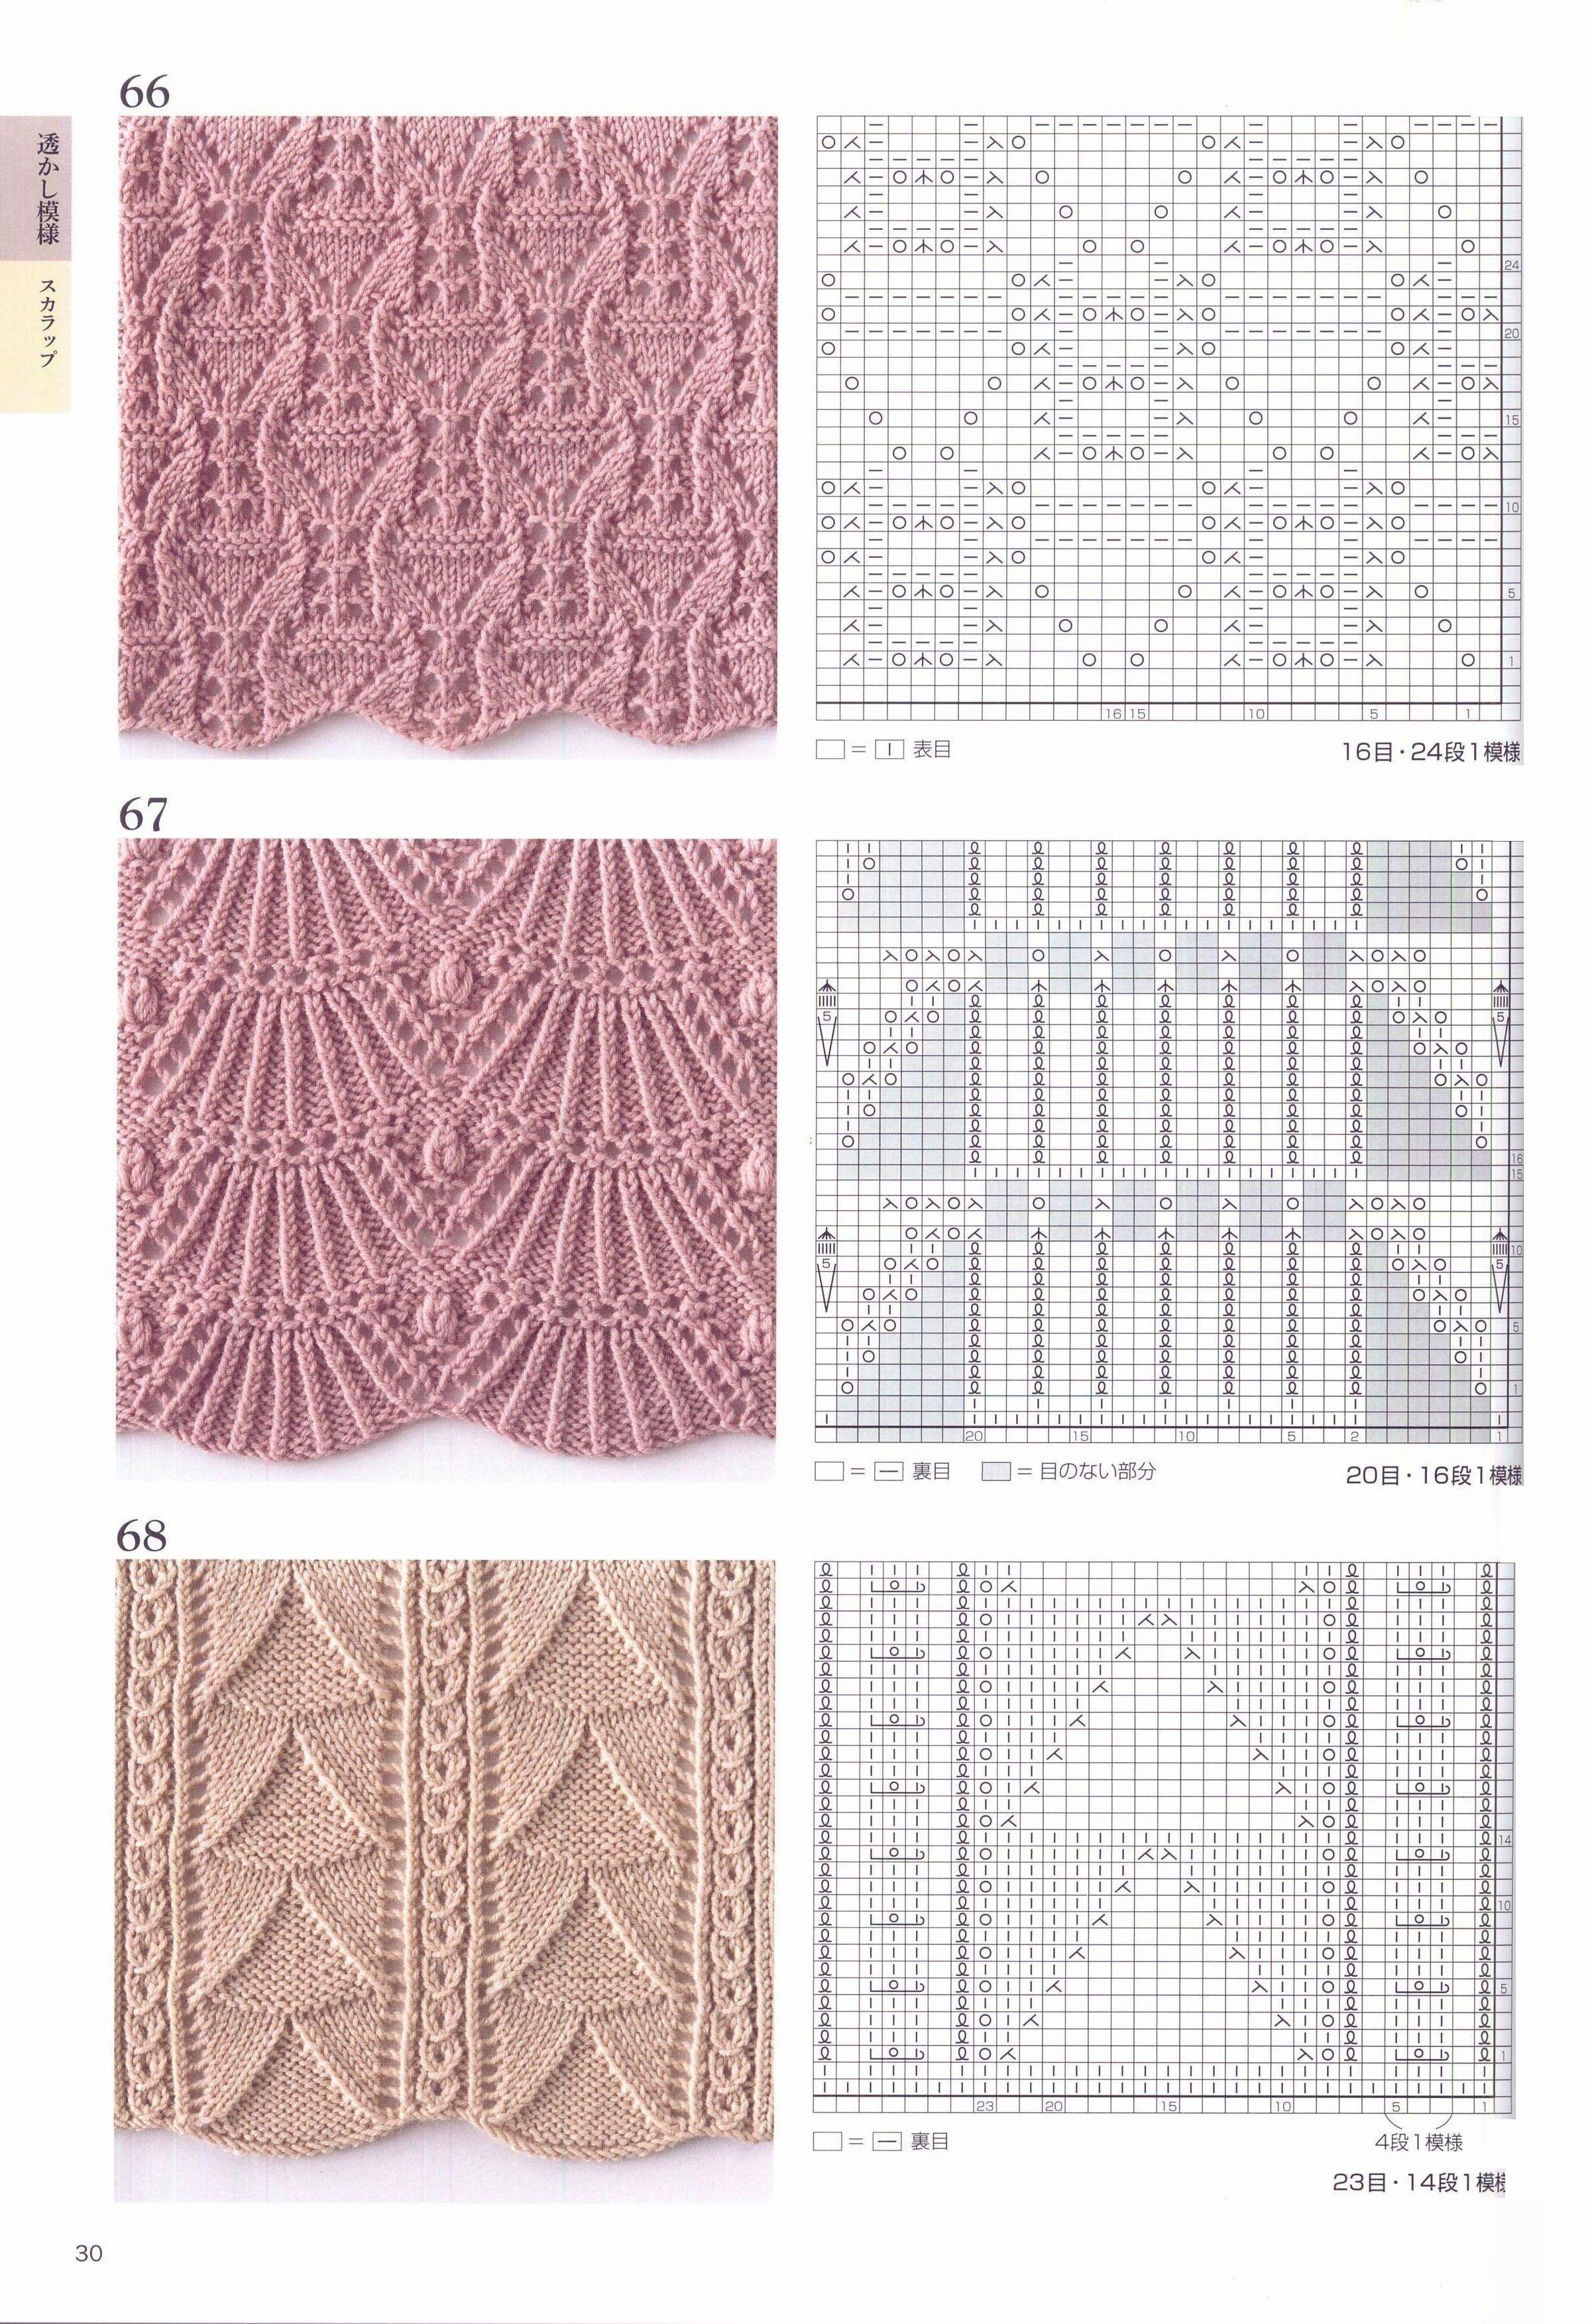 Pin de Ruth Escobar en puntadas espe | Knitting, Knit patterns y ...